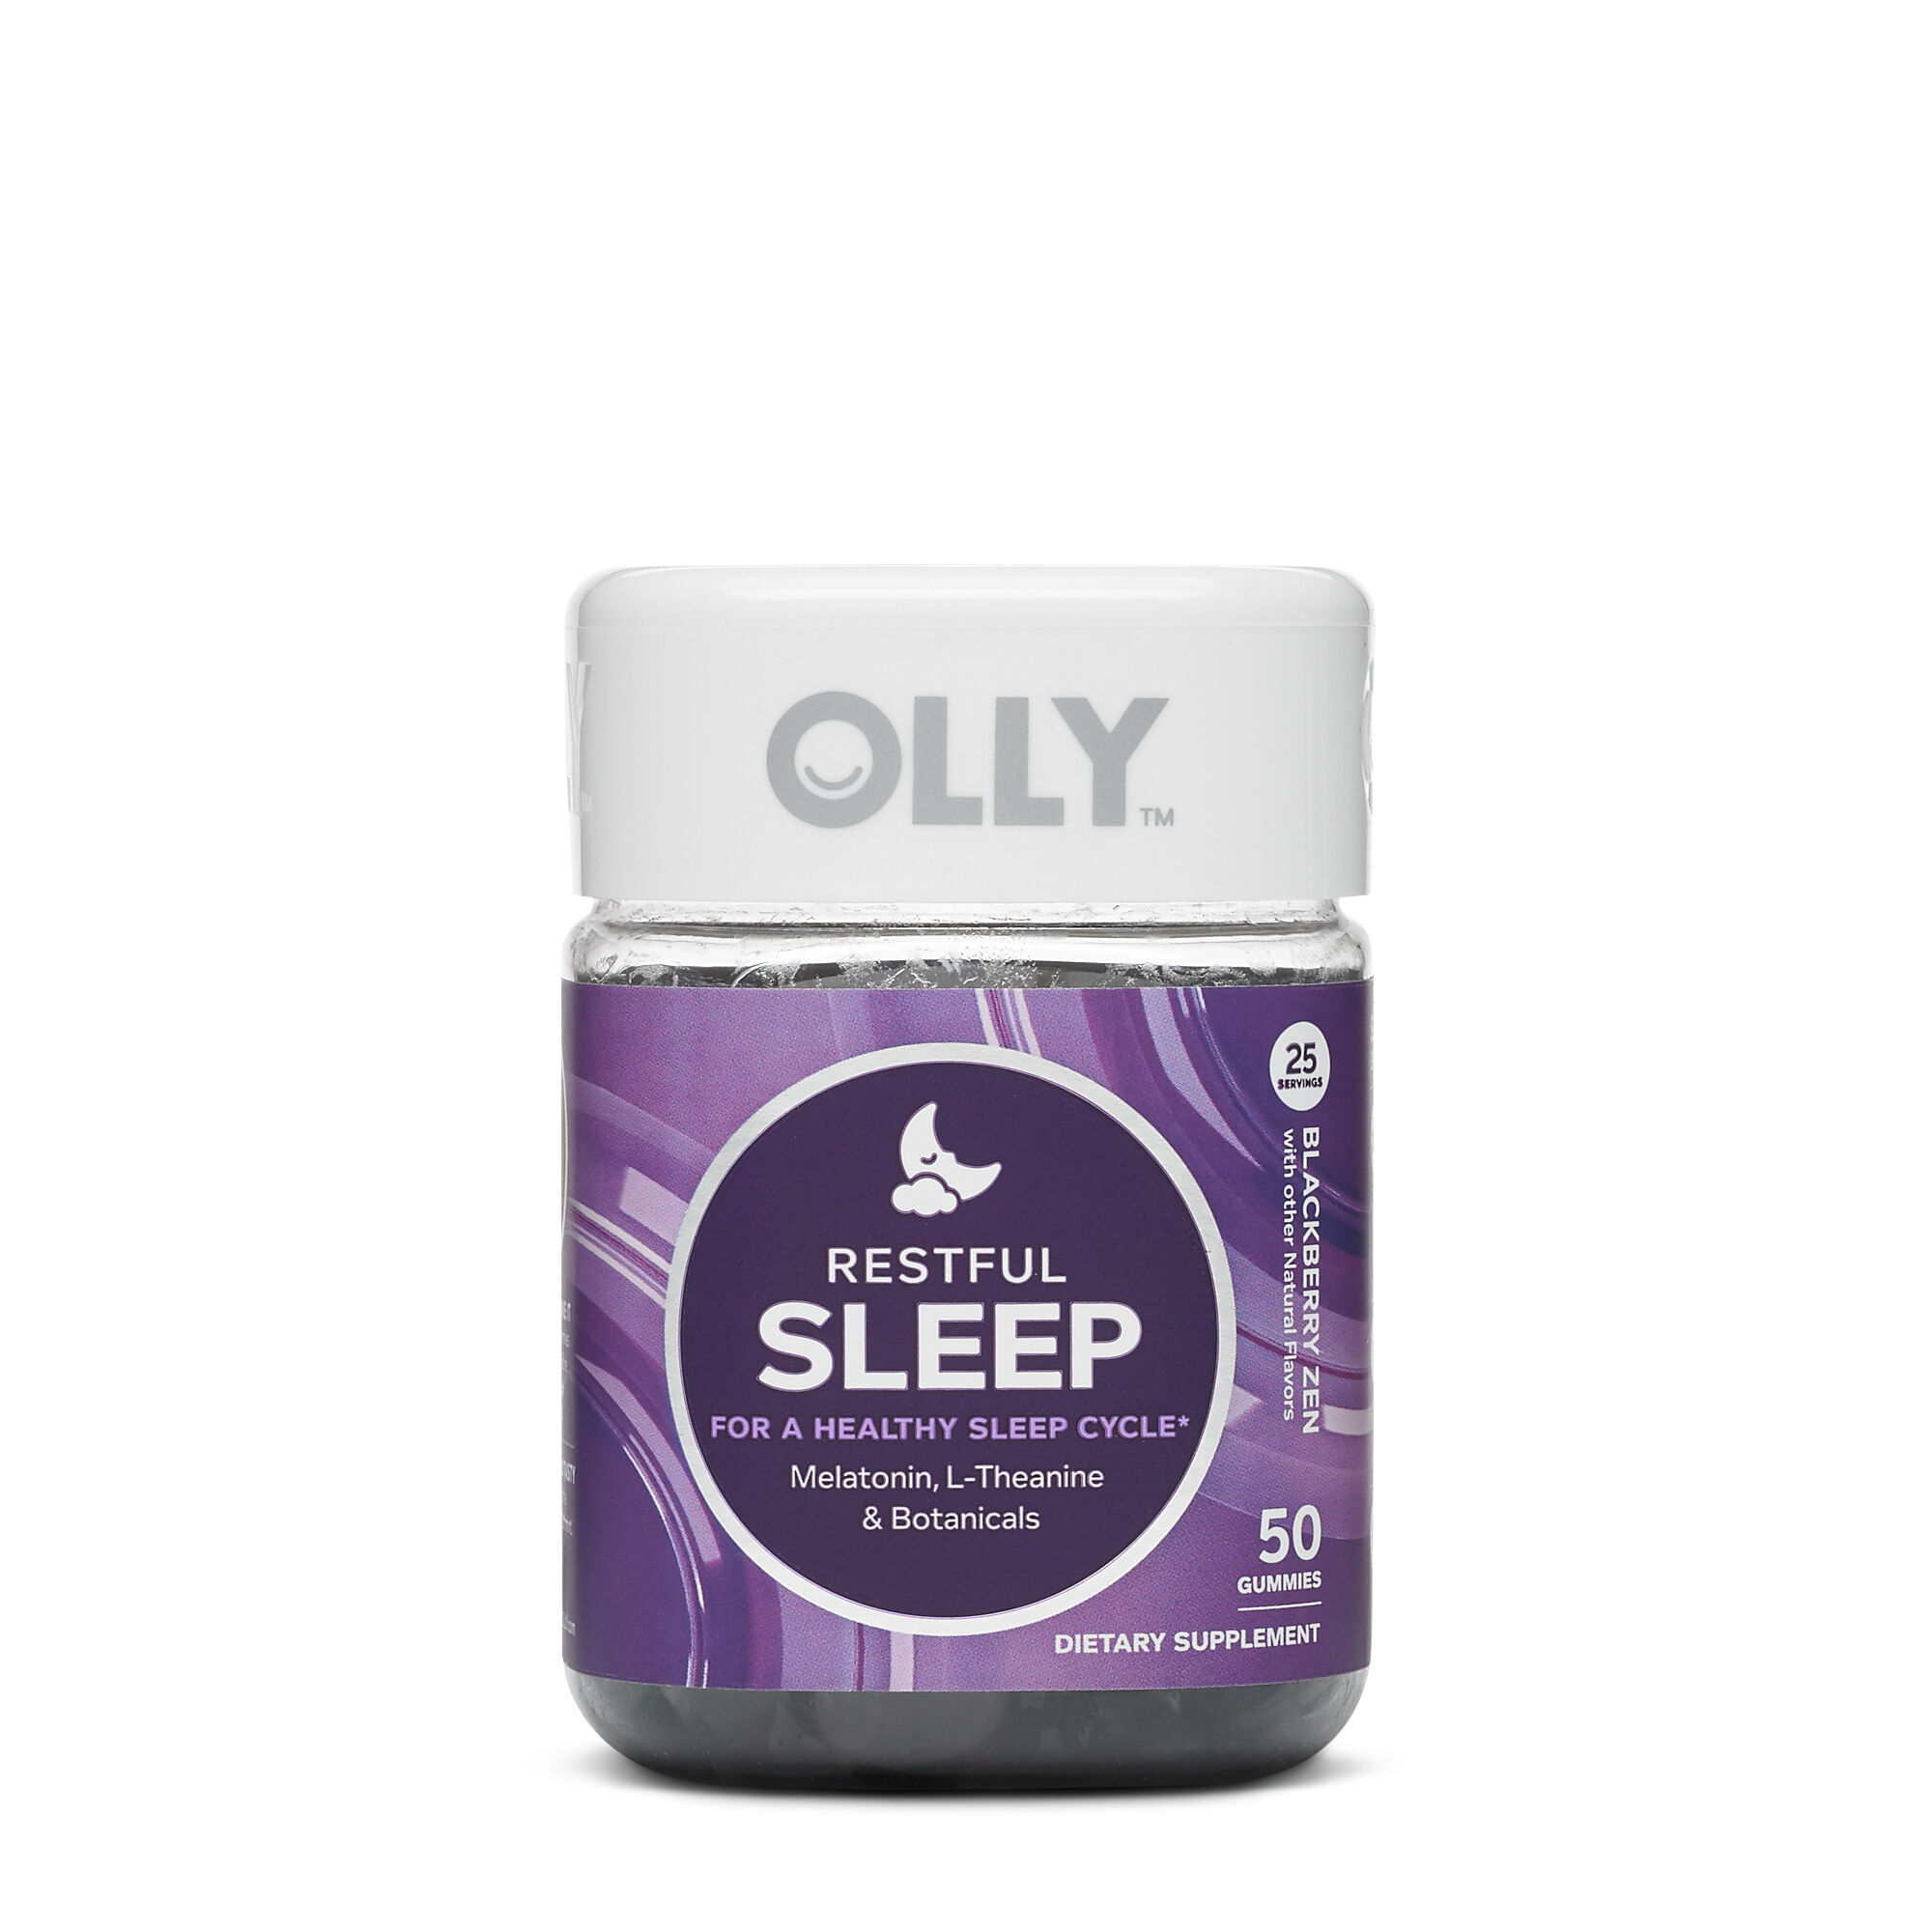 Olly Restful Sleep Blackberry Zen Gnc